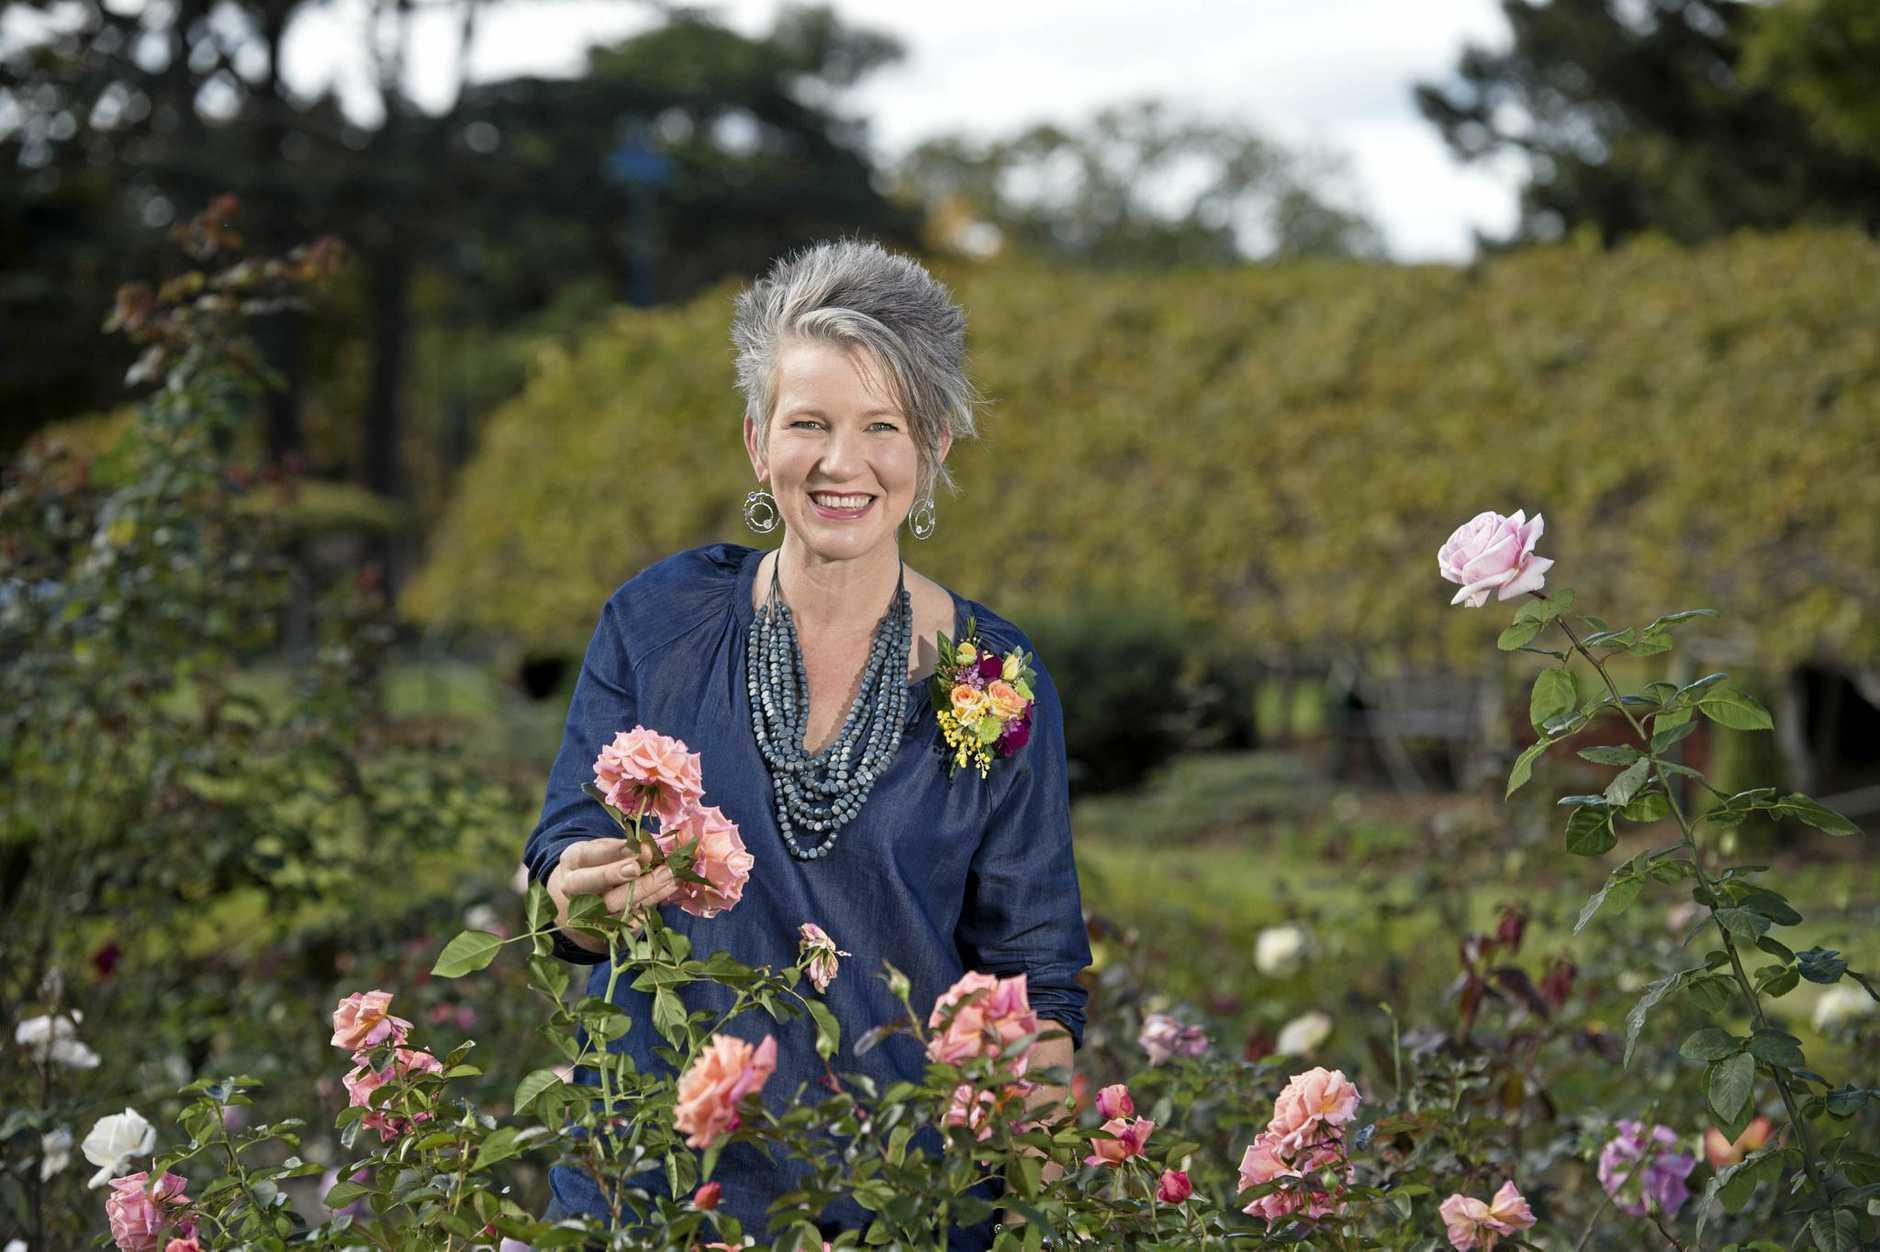 Gardening Australia host Sophie Thomson in Laurel Bank Park to promote the Carnival of Flowers, Wednesday, June 14, 2017.